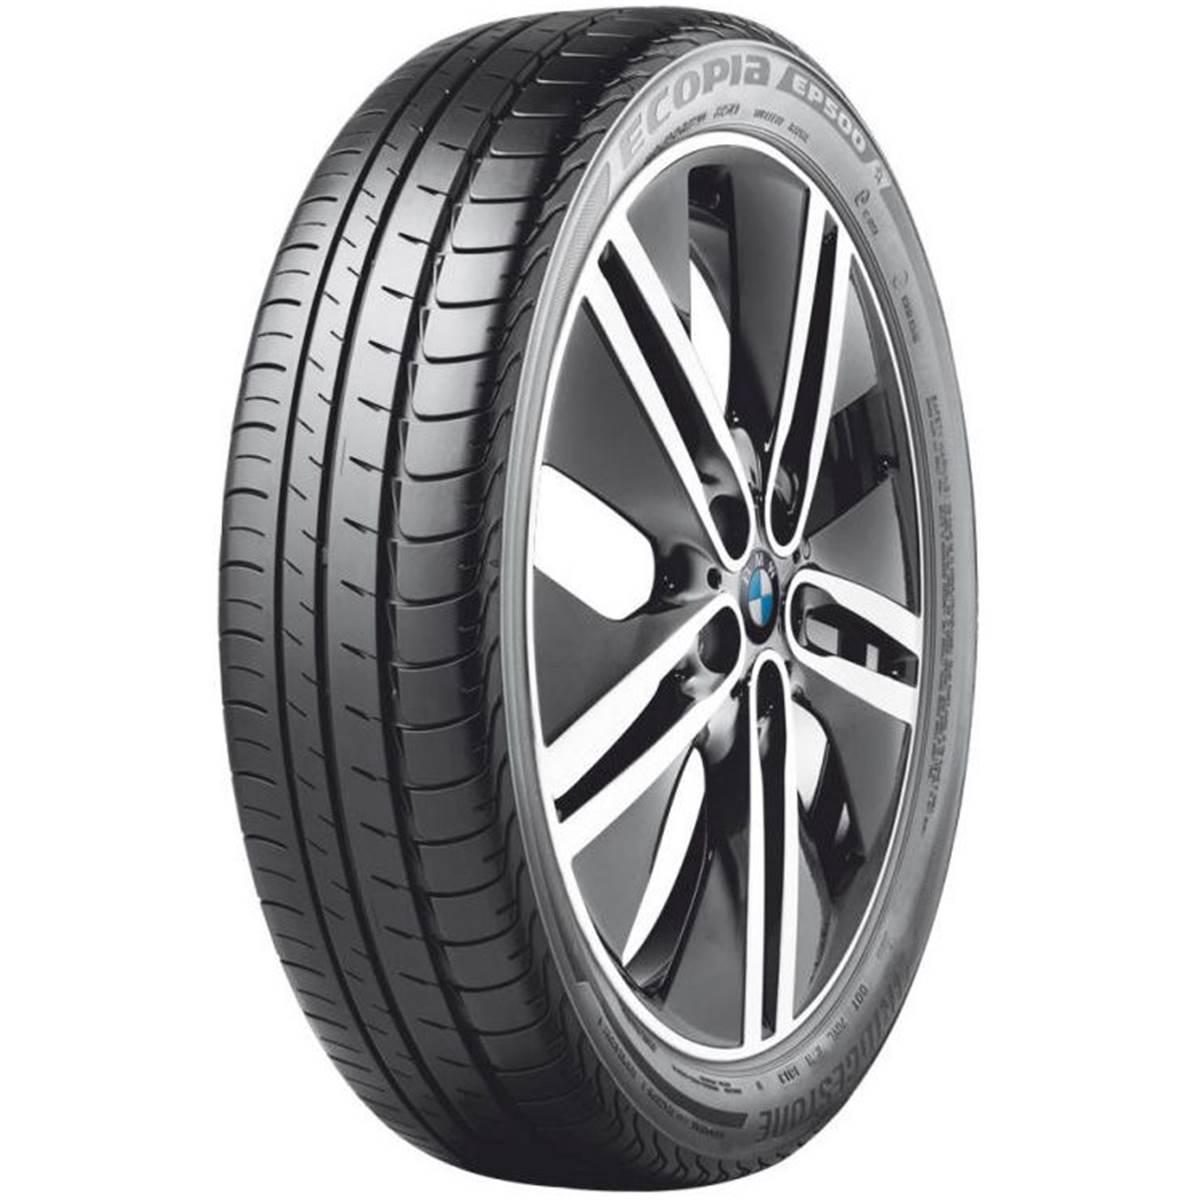 Pneu Bridgestone 175/55R20 89Q Ecopia Ep500 homologué BMW XL